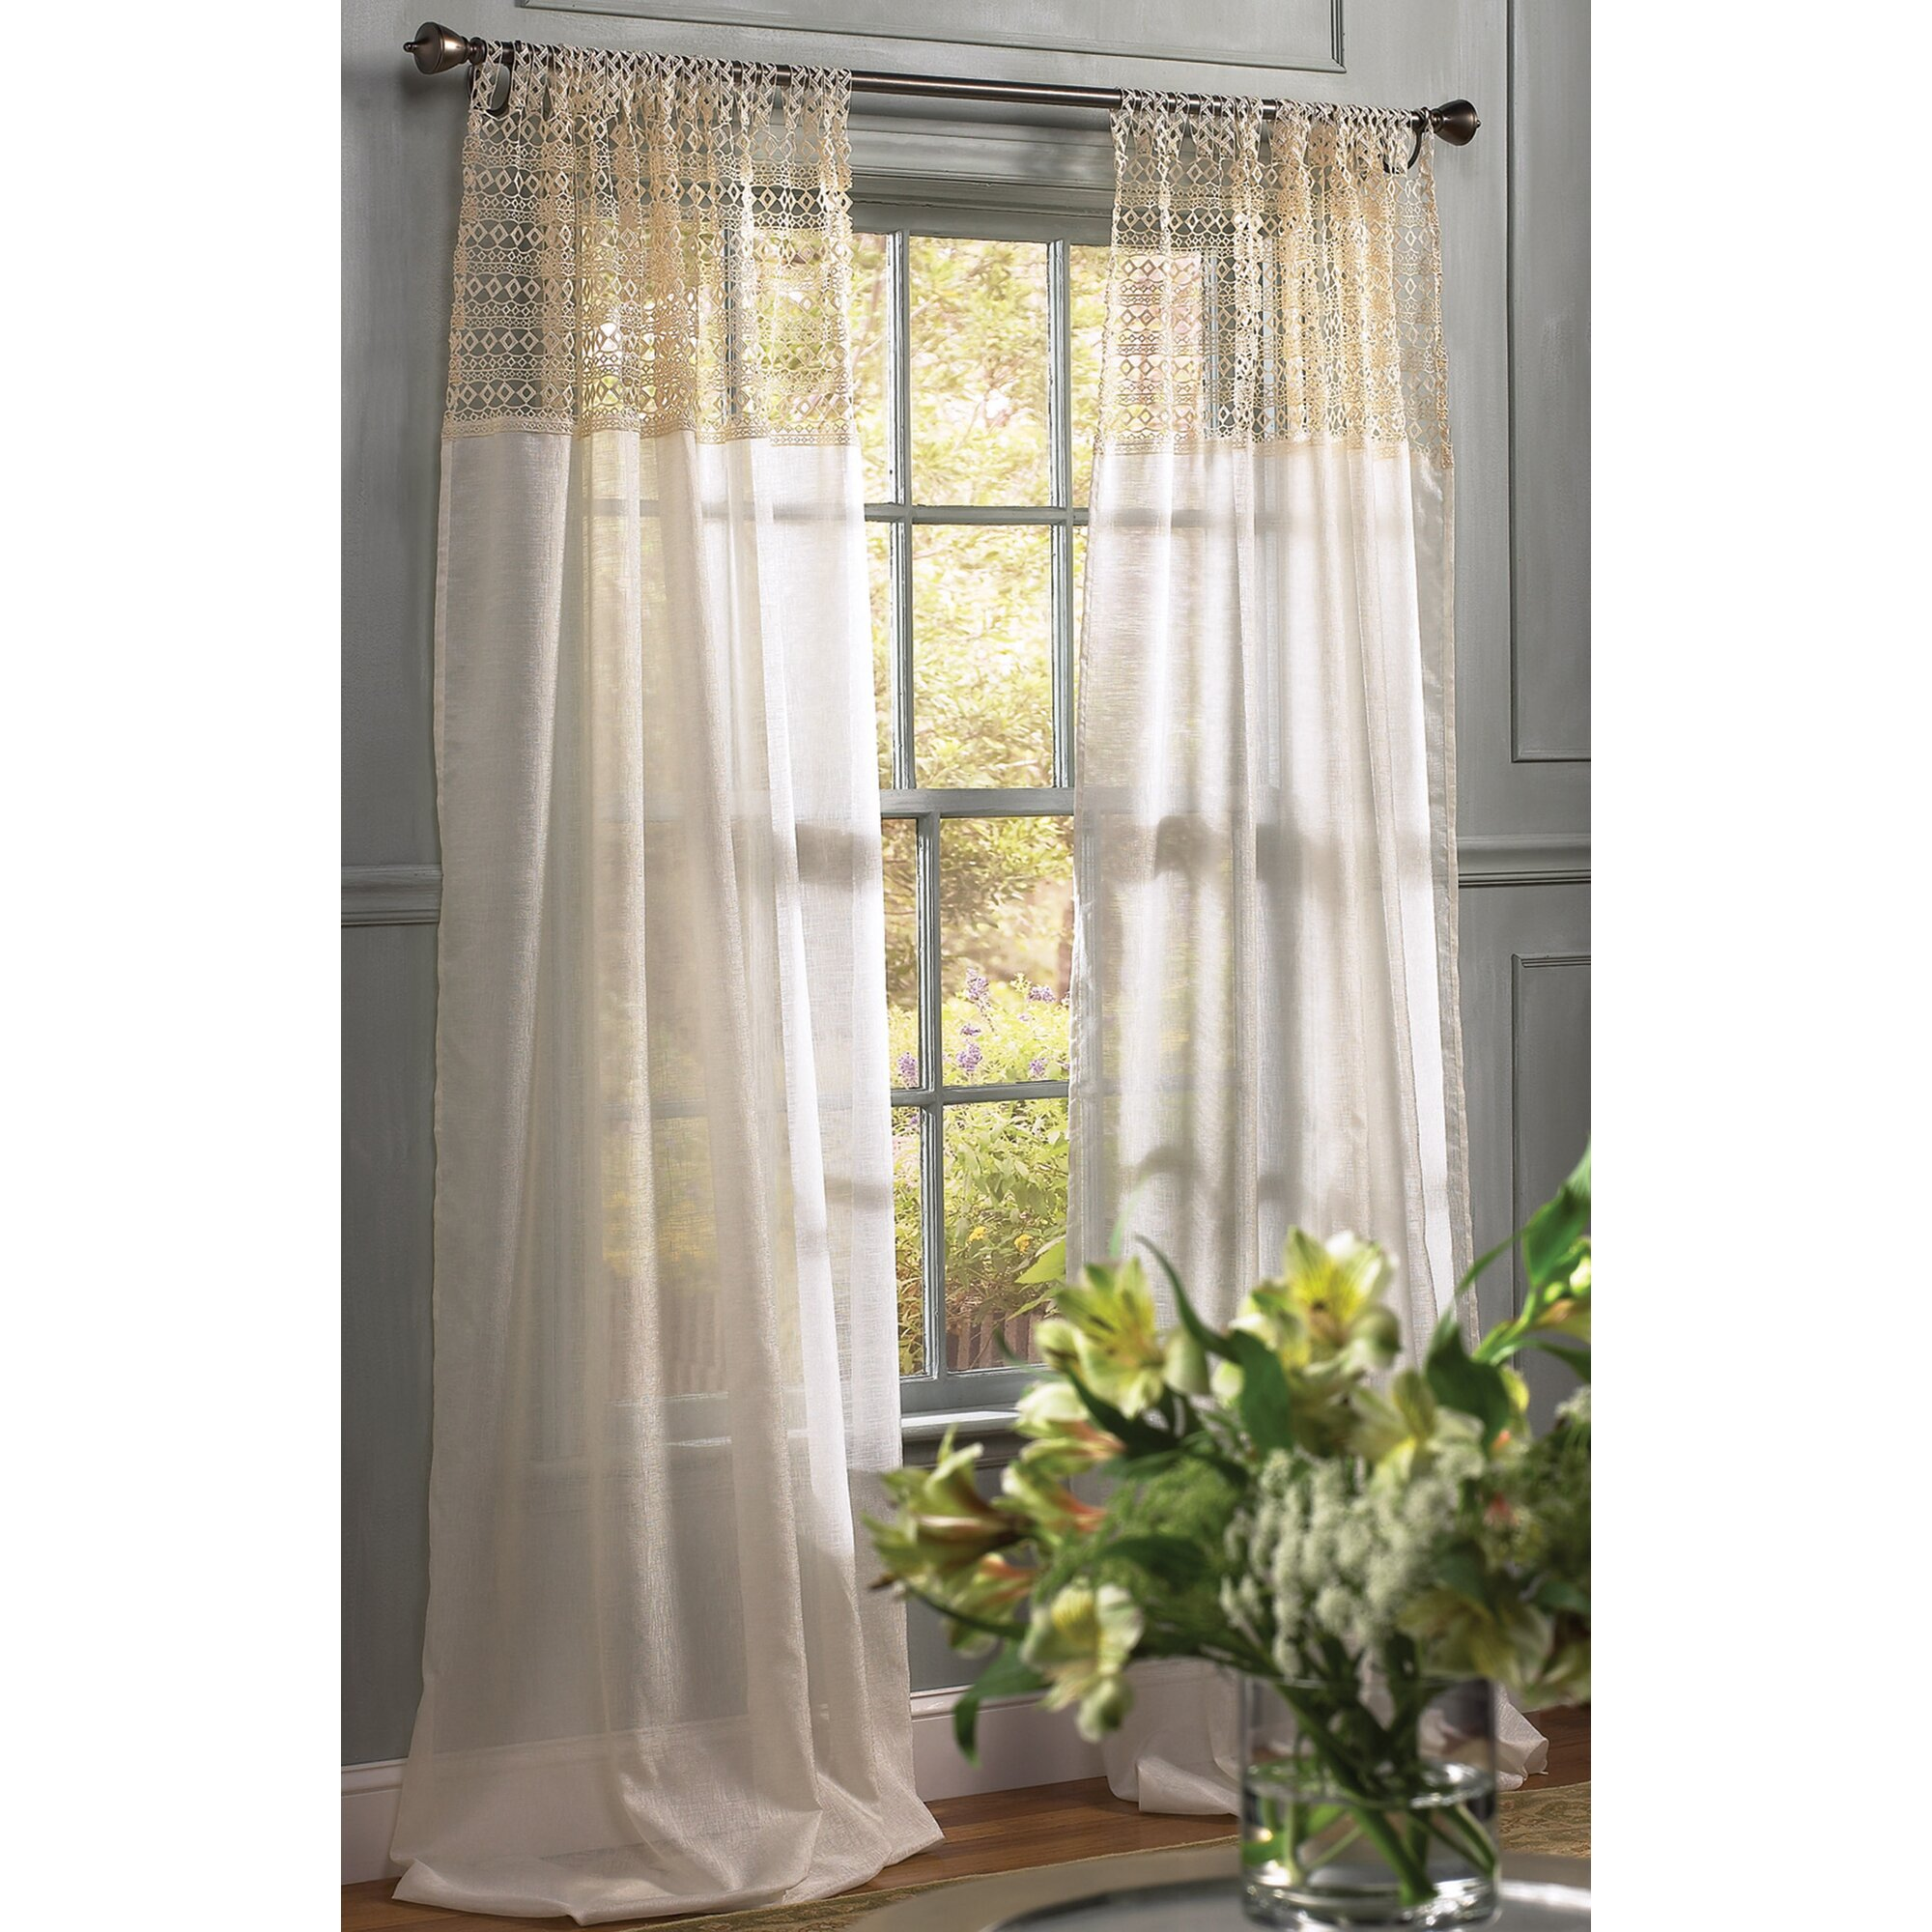 Velcro french door curtain panels - Velcro French Door Curtain Panels 87